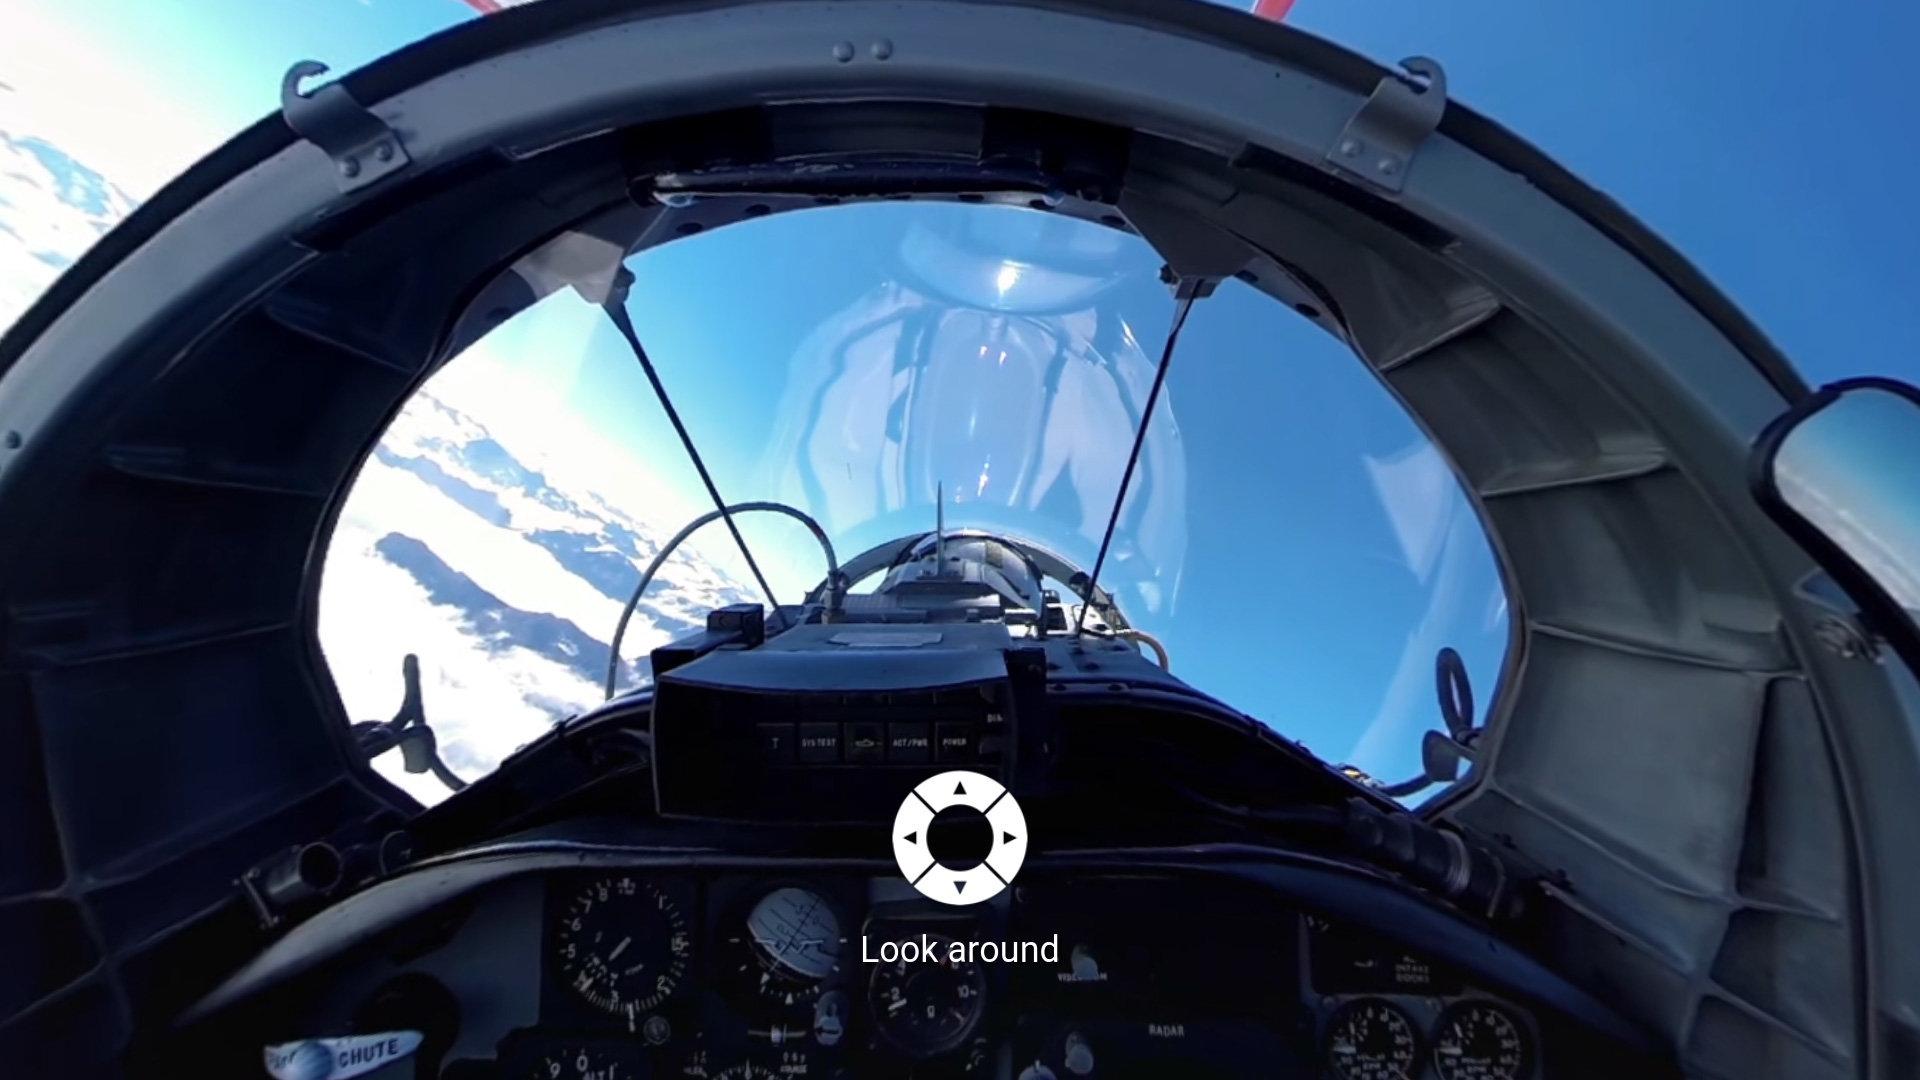 360-Grad-Videos in der YouTube-App